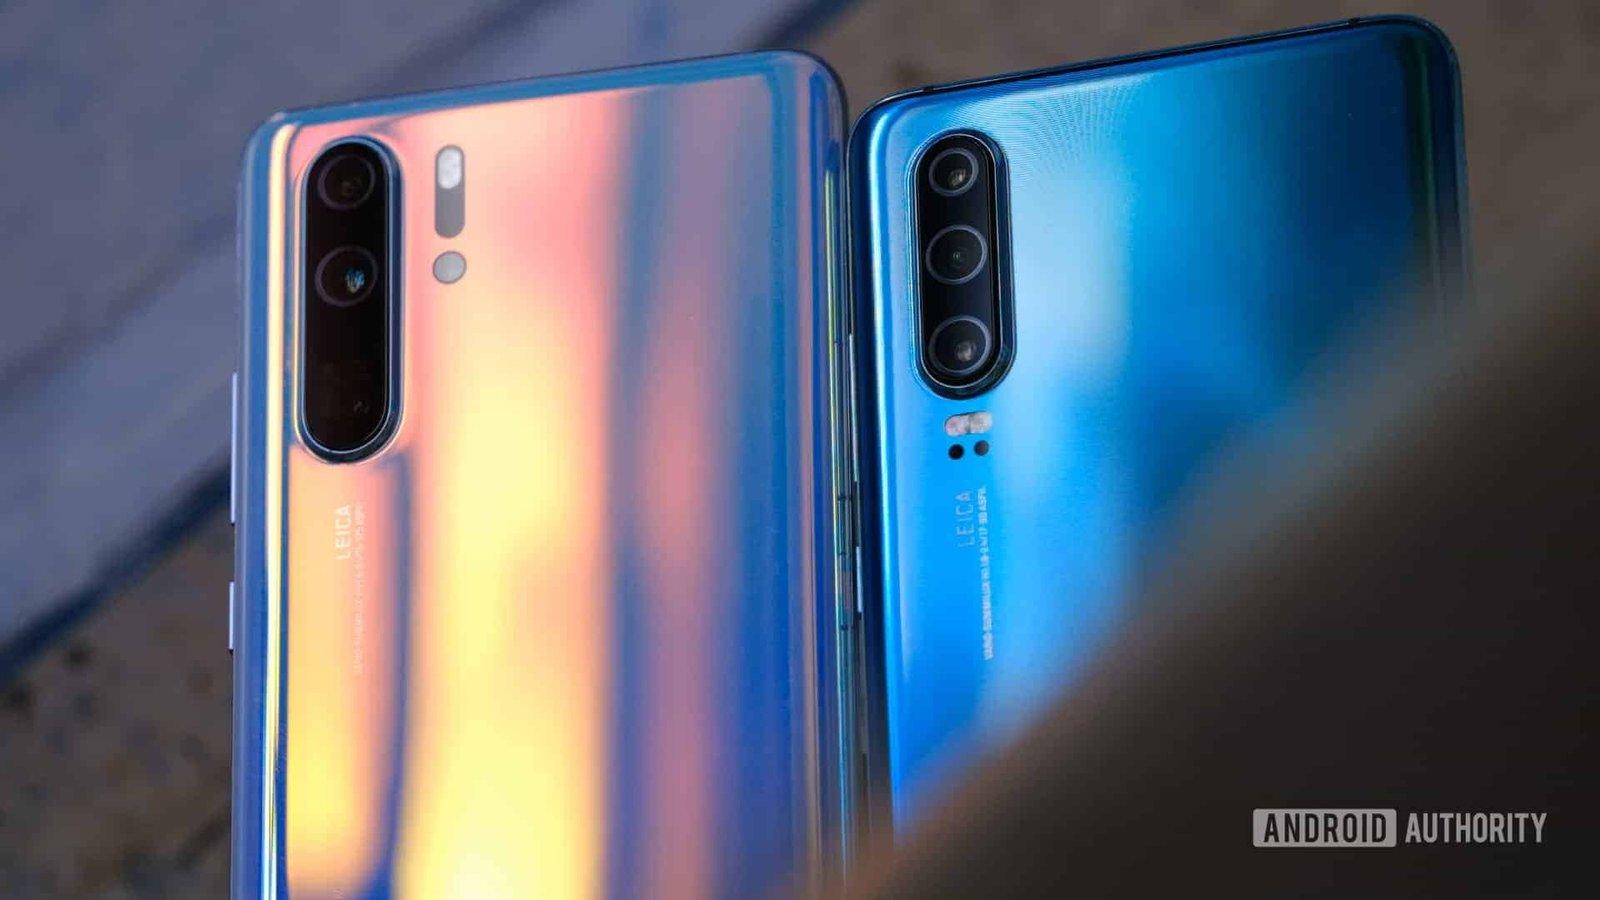 Huawei-P30-Pro-and-Huawei-P30-backs.jpeg